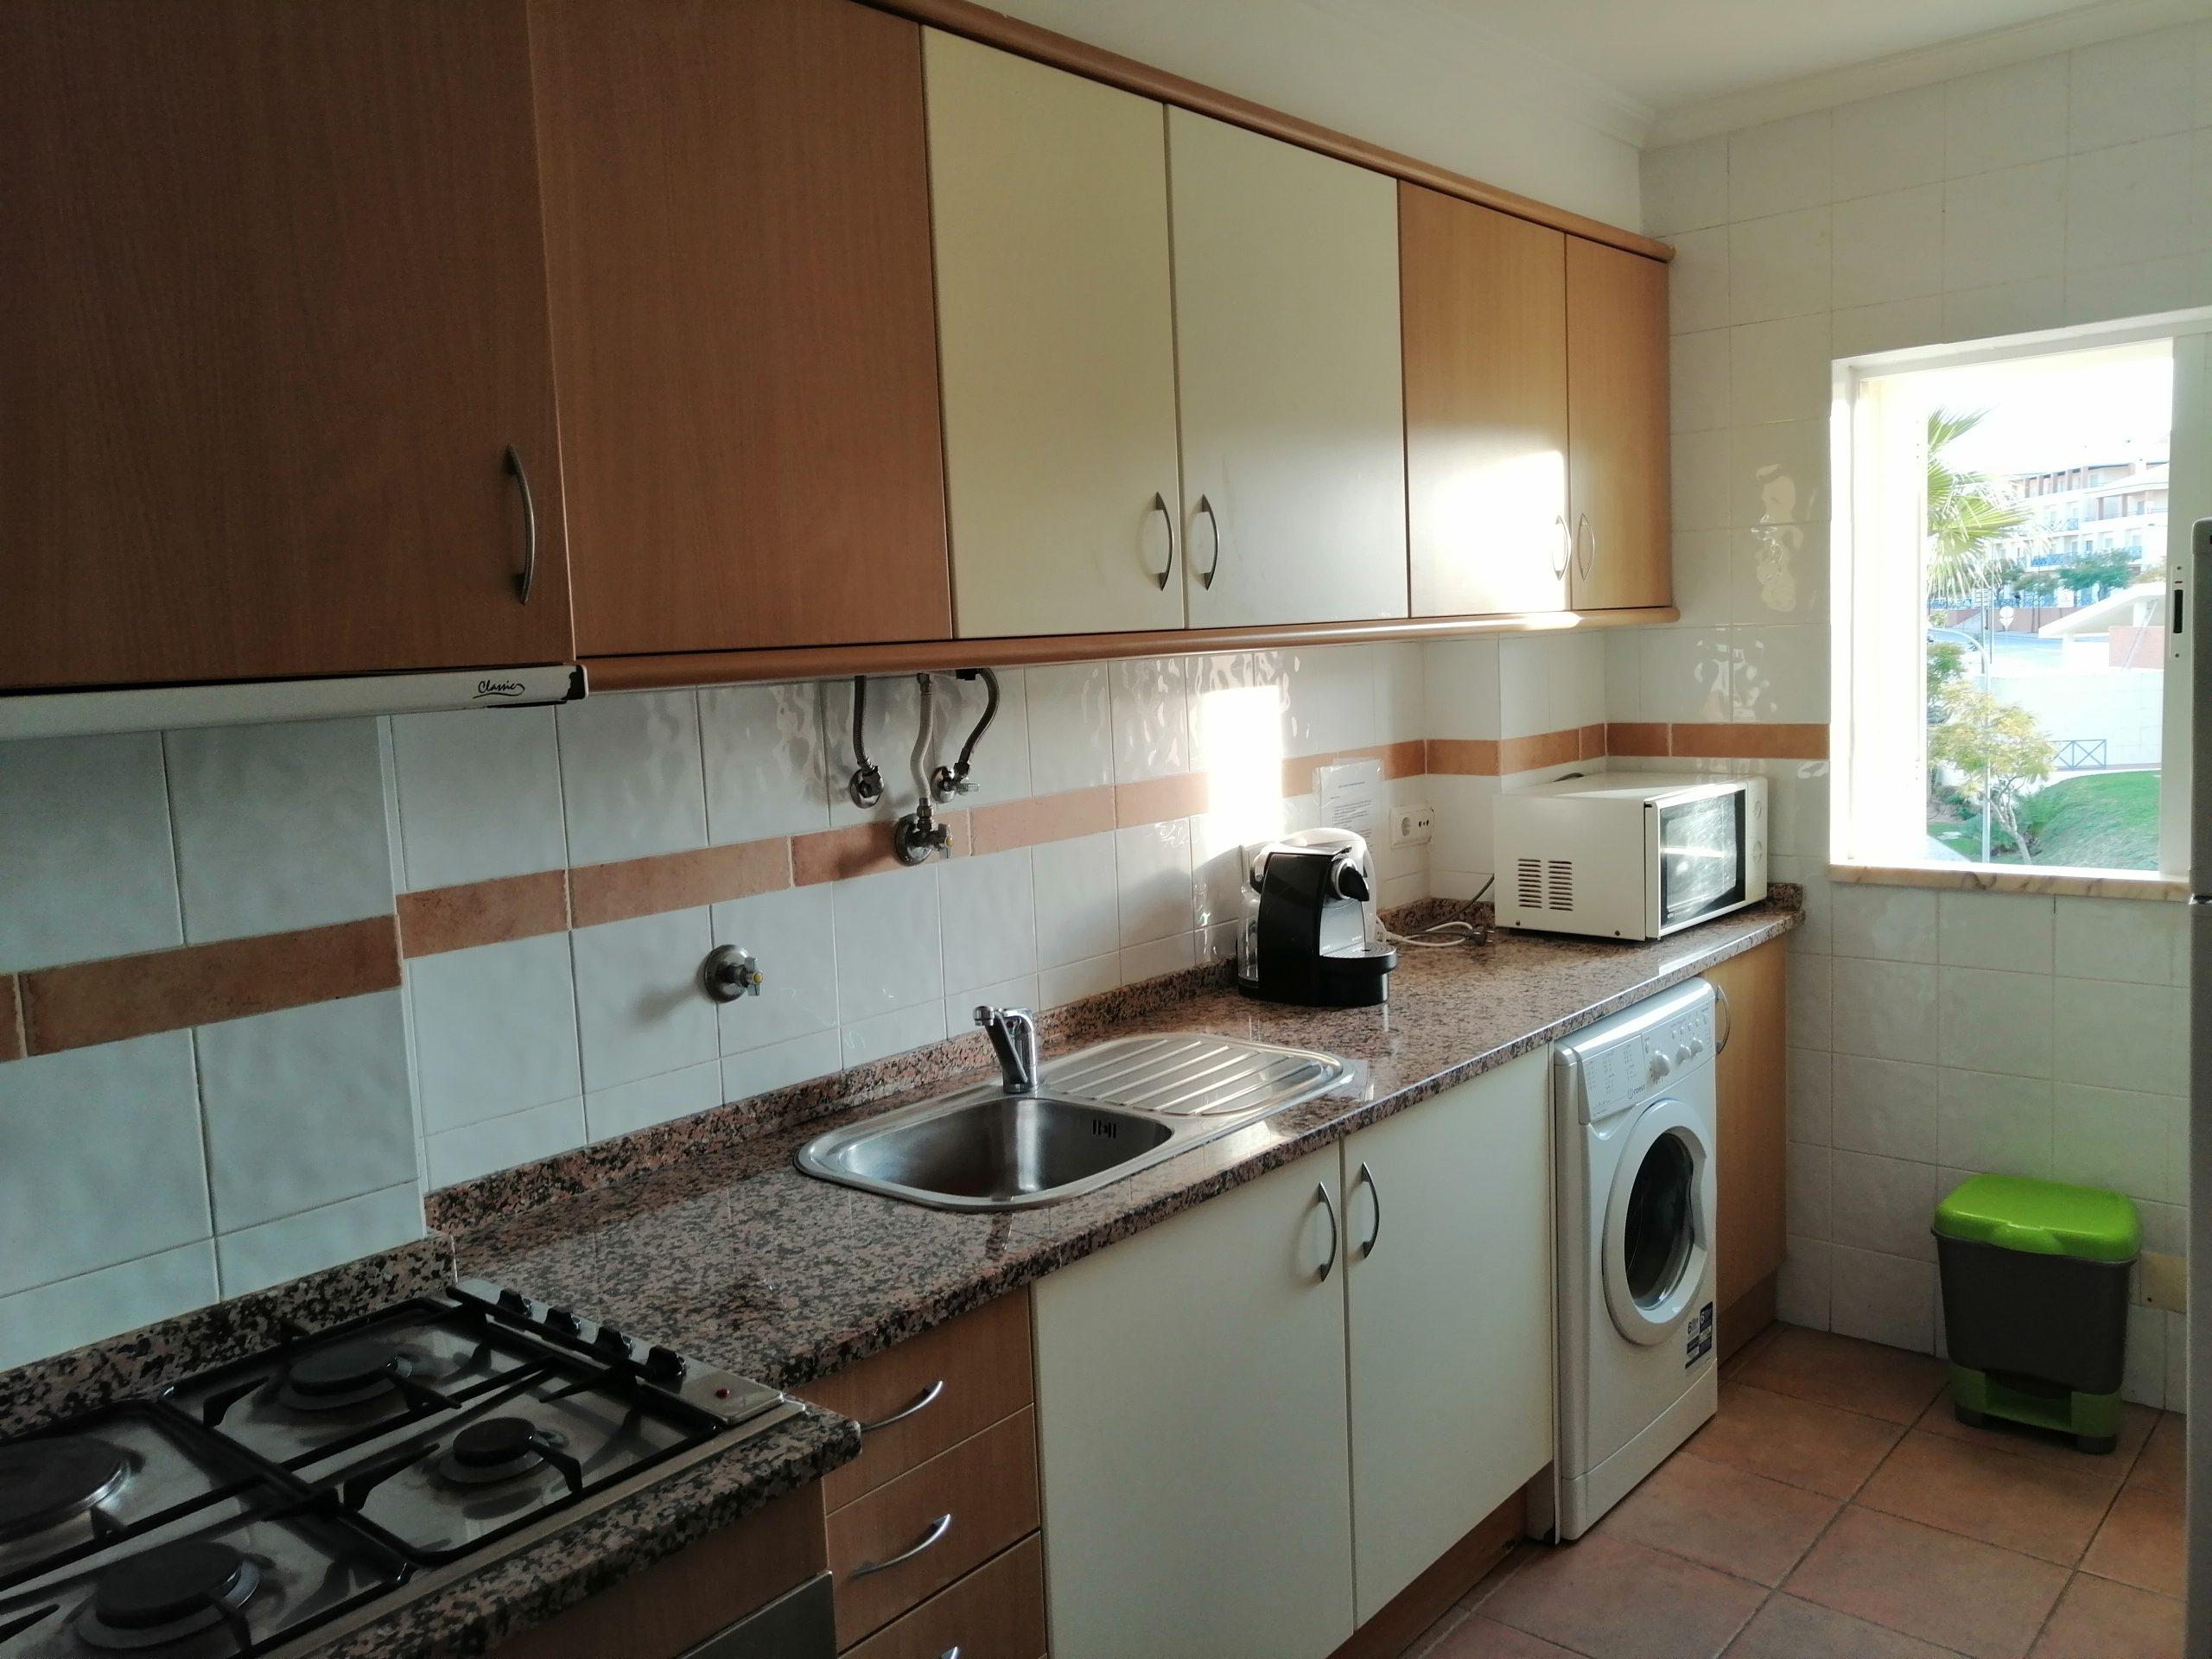 Holiday apartments and villas for rent, T1 Albufeira em cond. fechado c/ piscina 4/5 pessoas JUN / JUL / AGO / SET in Albufeira, Portugal Algarve, REF_IMG_14867_14878